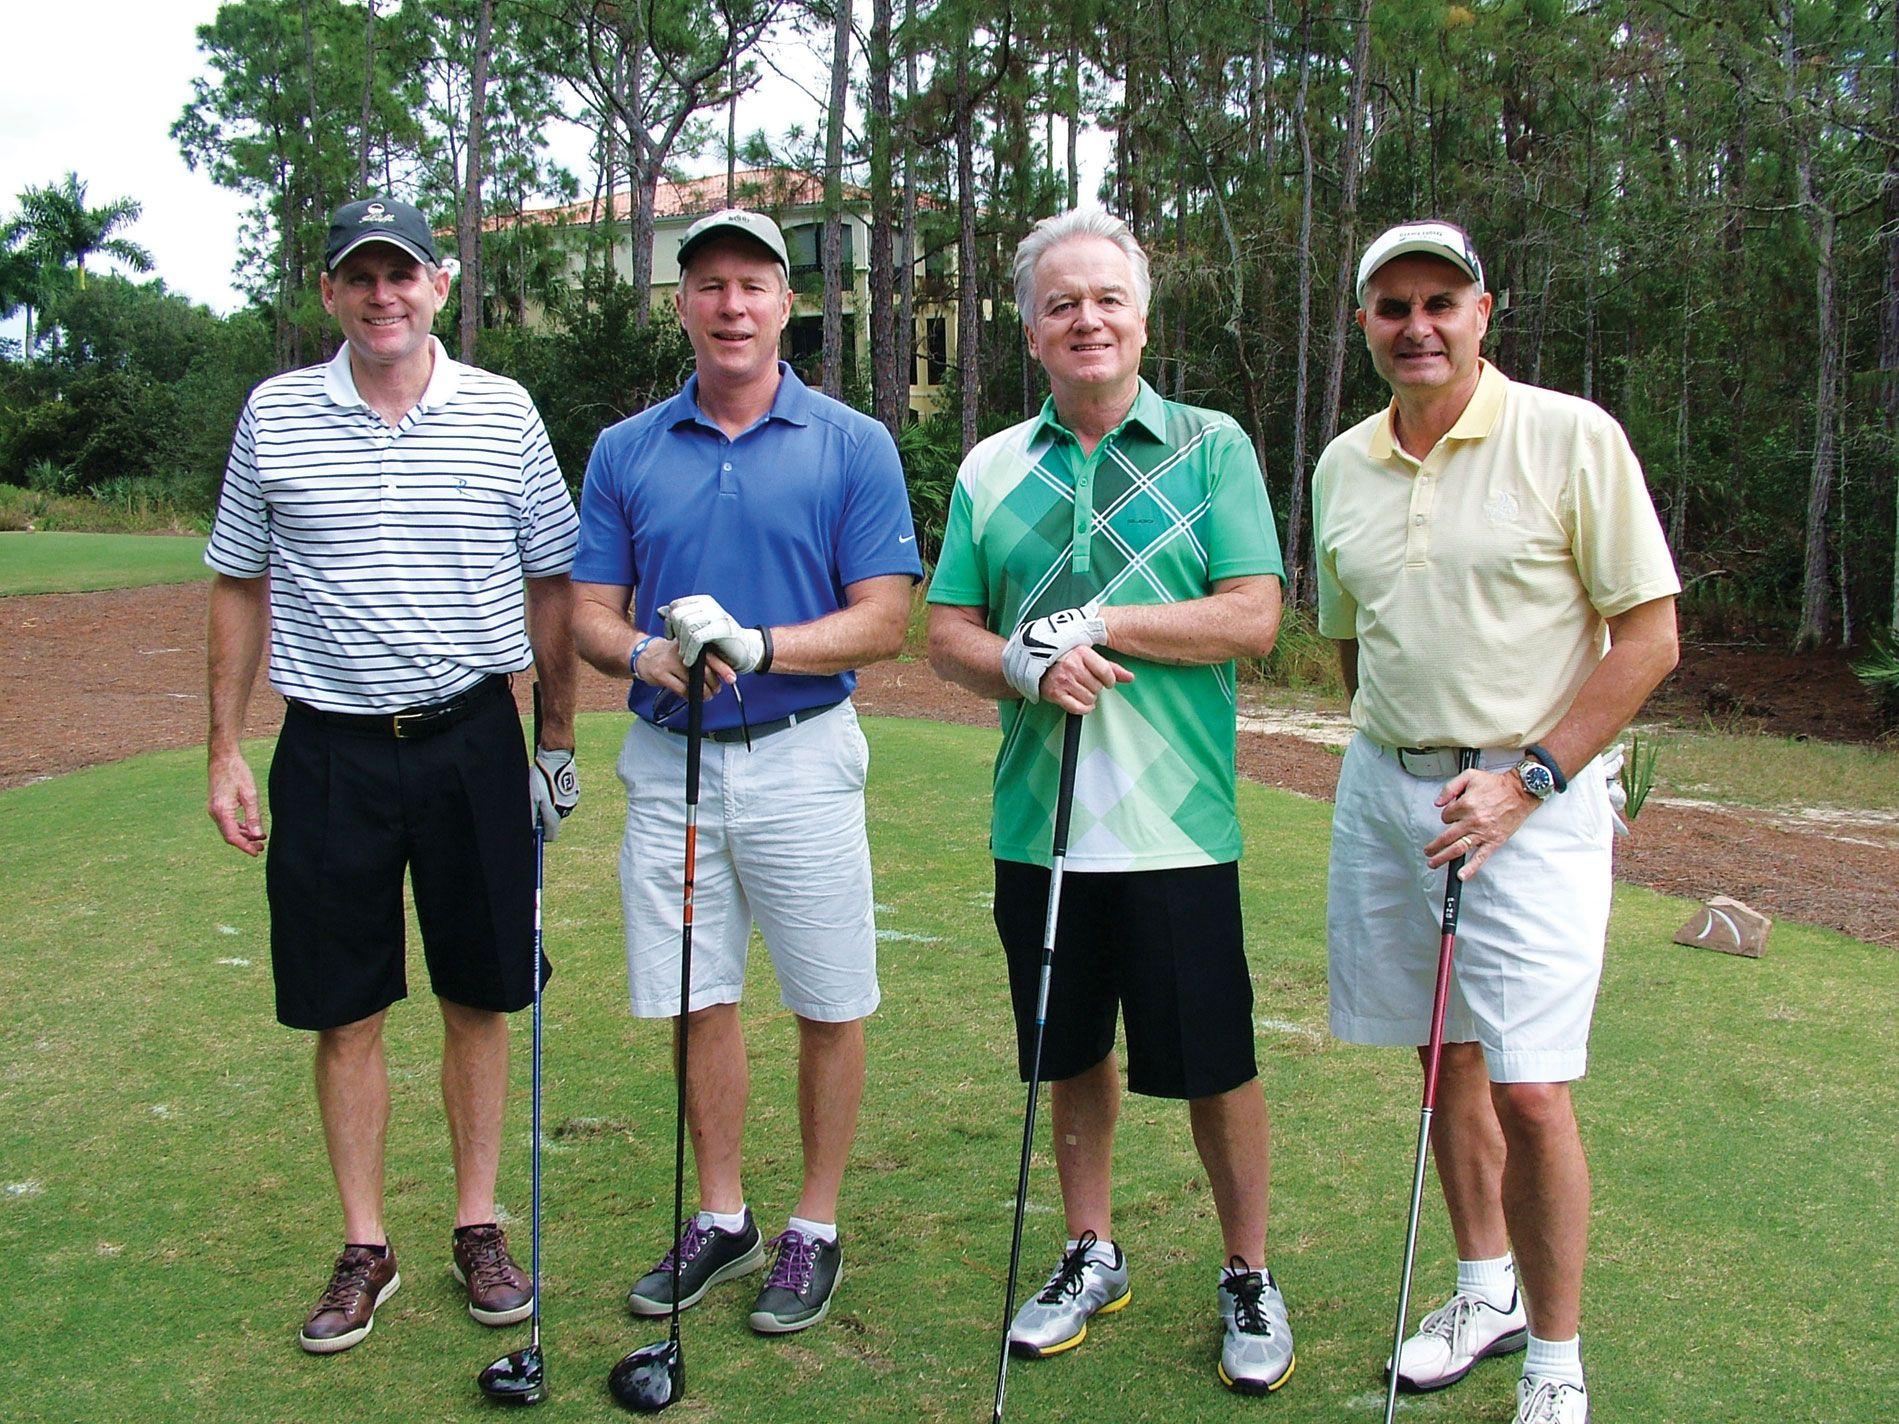 Jeff McWey, Left, GBS Enterprises; Marty Melcher, Serta; Dave Powers,